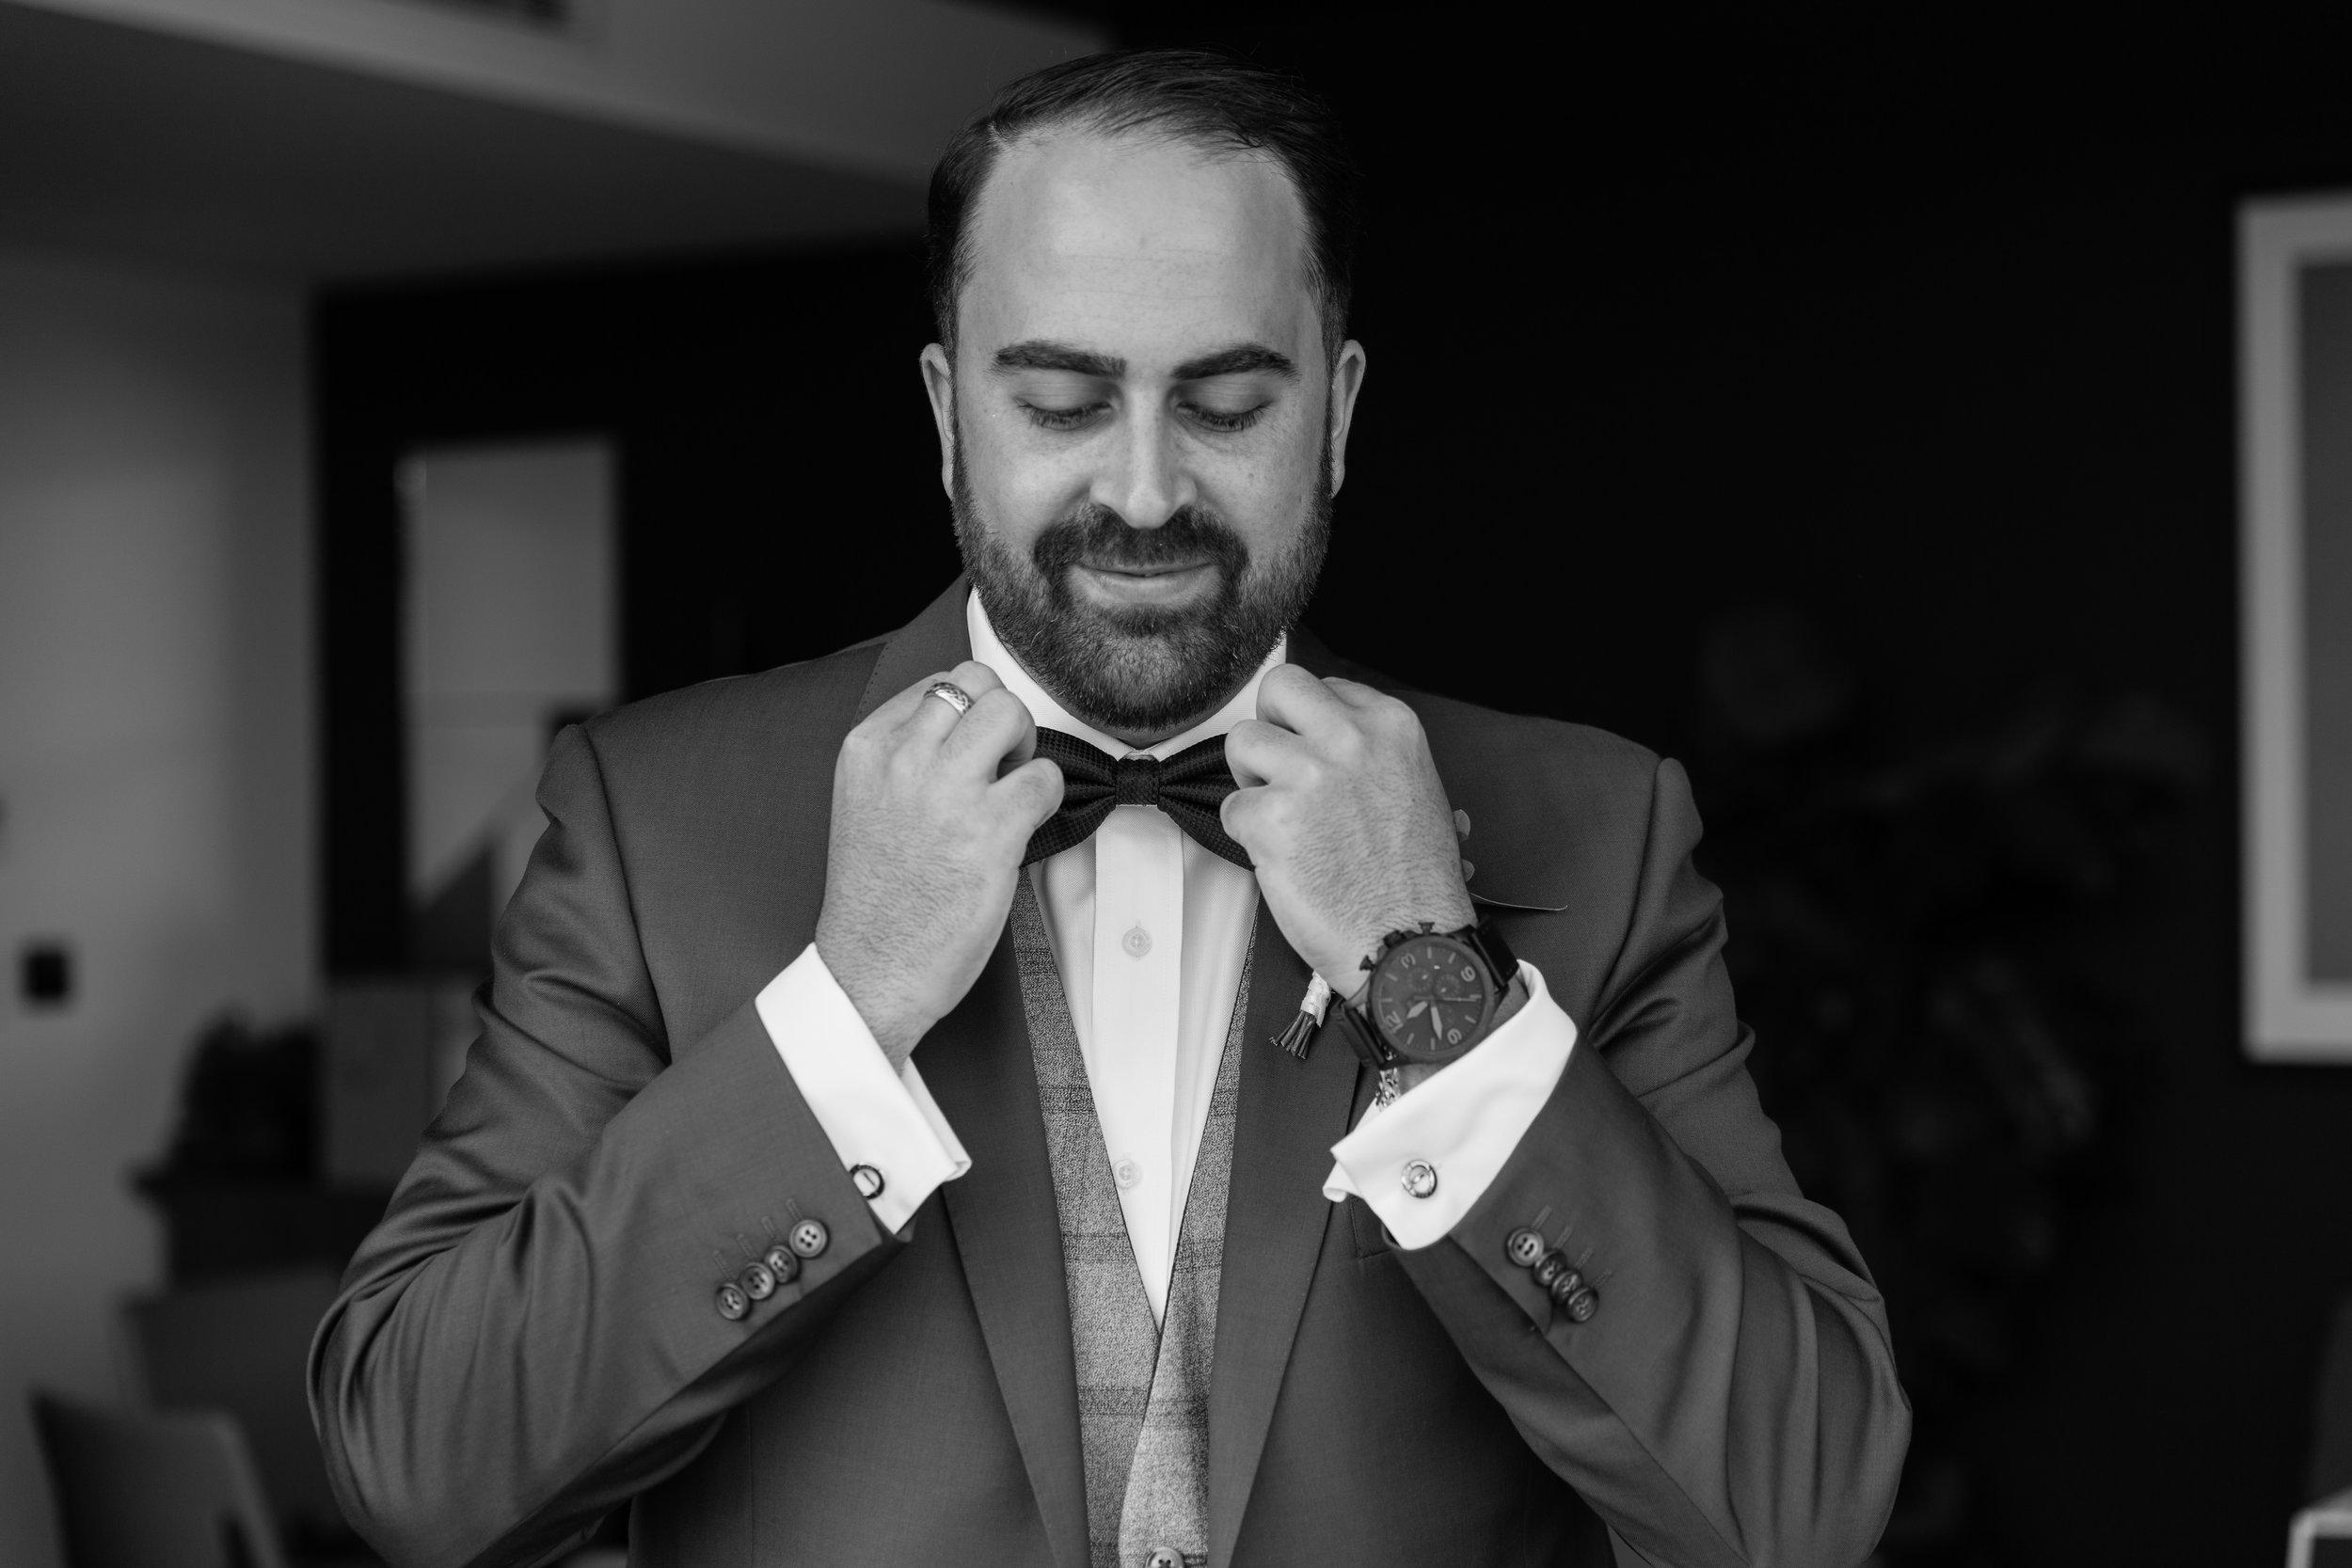 brisbane-city-wedding-photographer-romantic-wedding-30.jpg